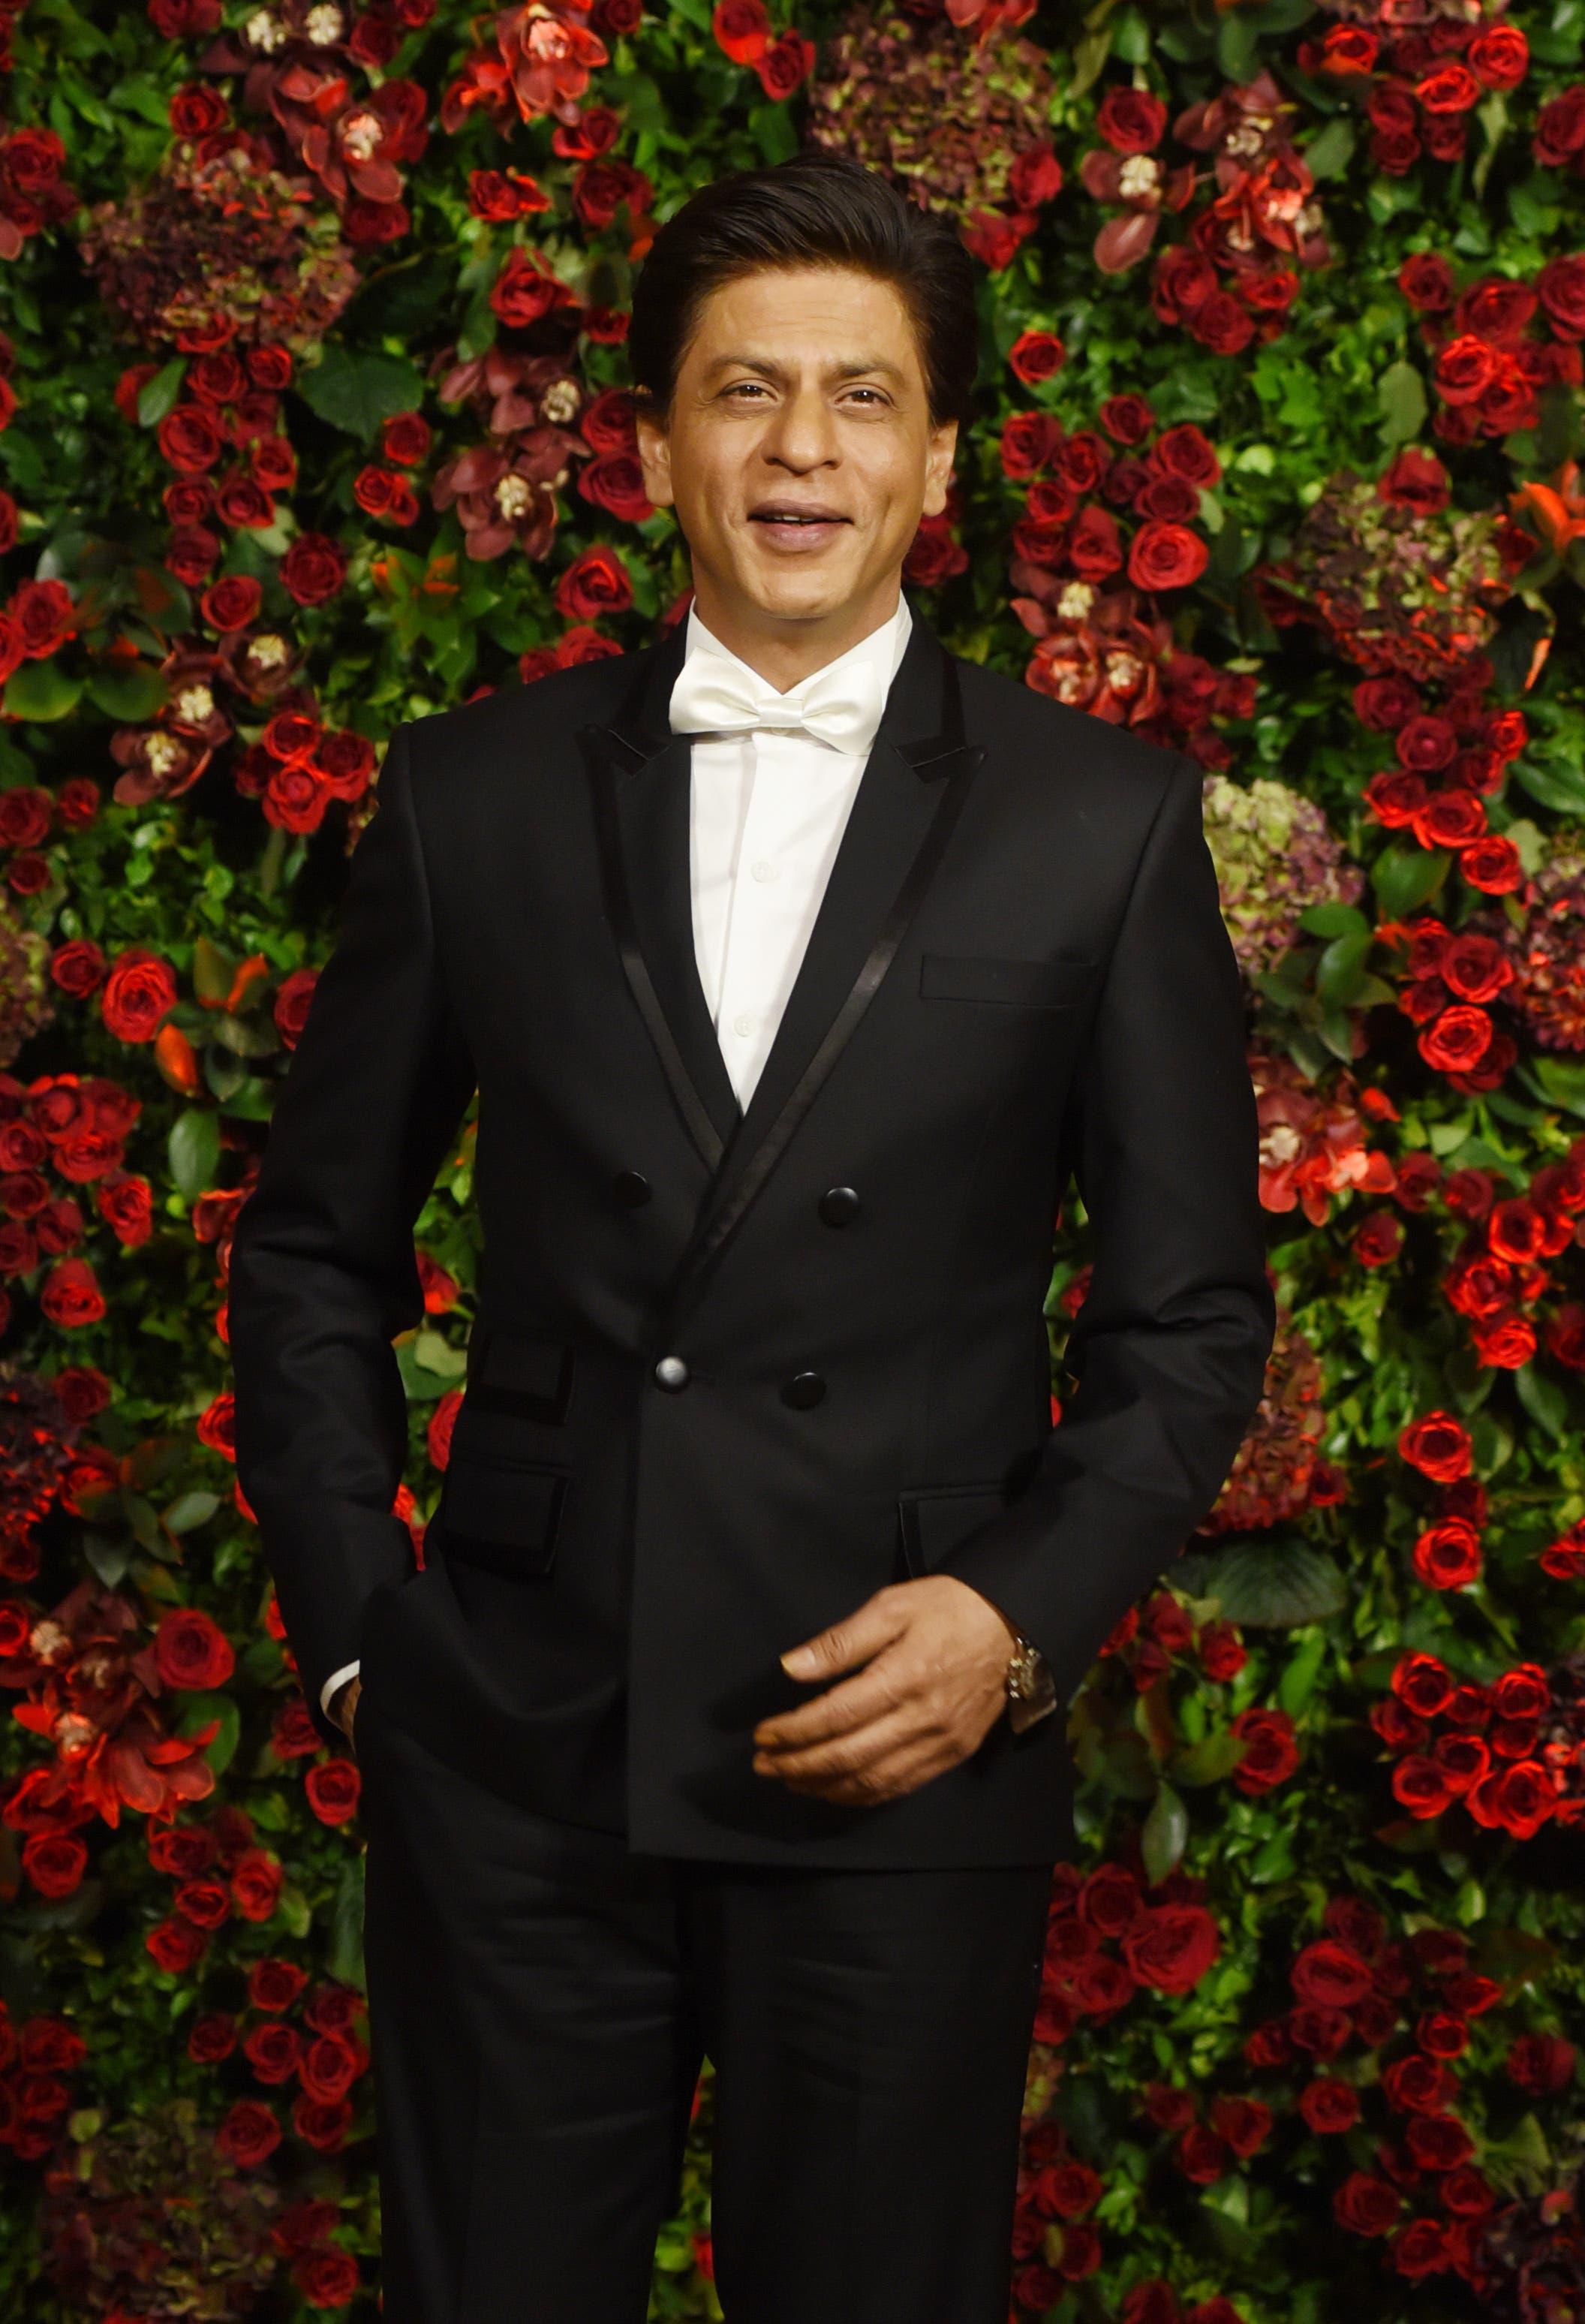 Indian Bollywood actor Shah Rukh Khan. (AFP)